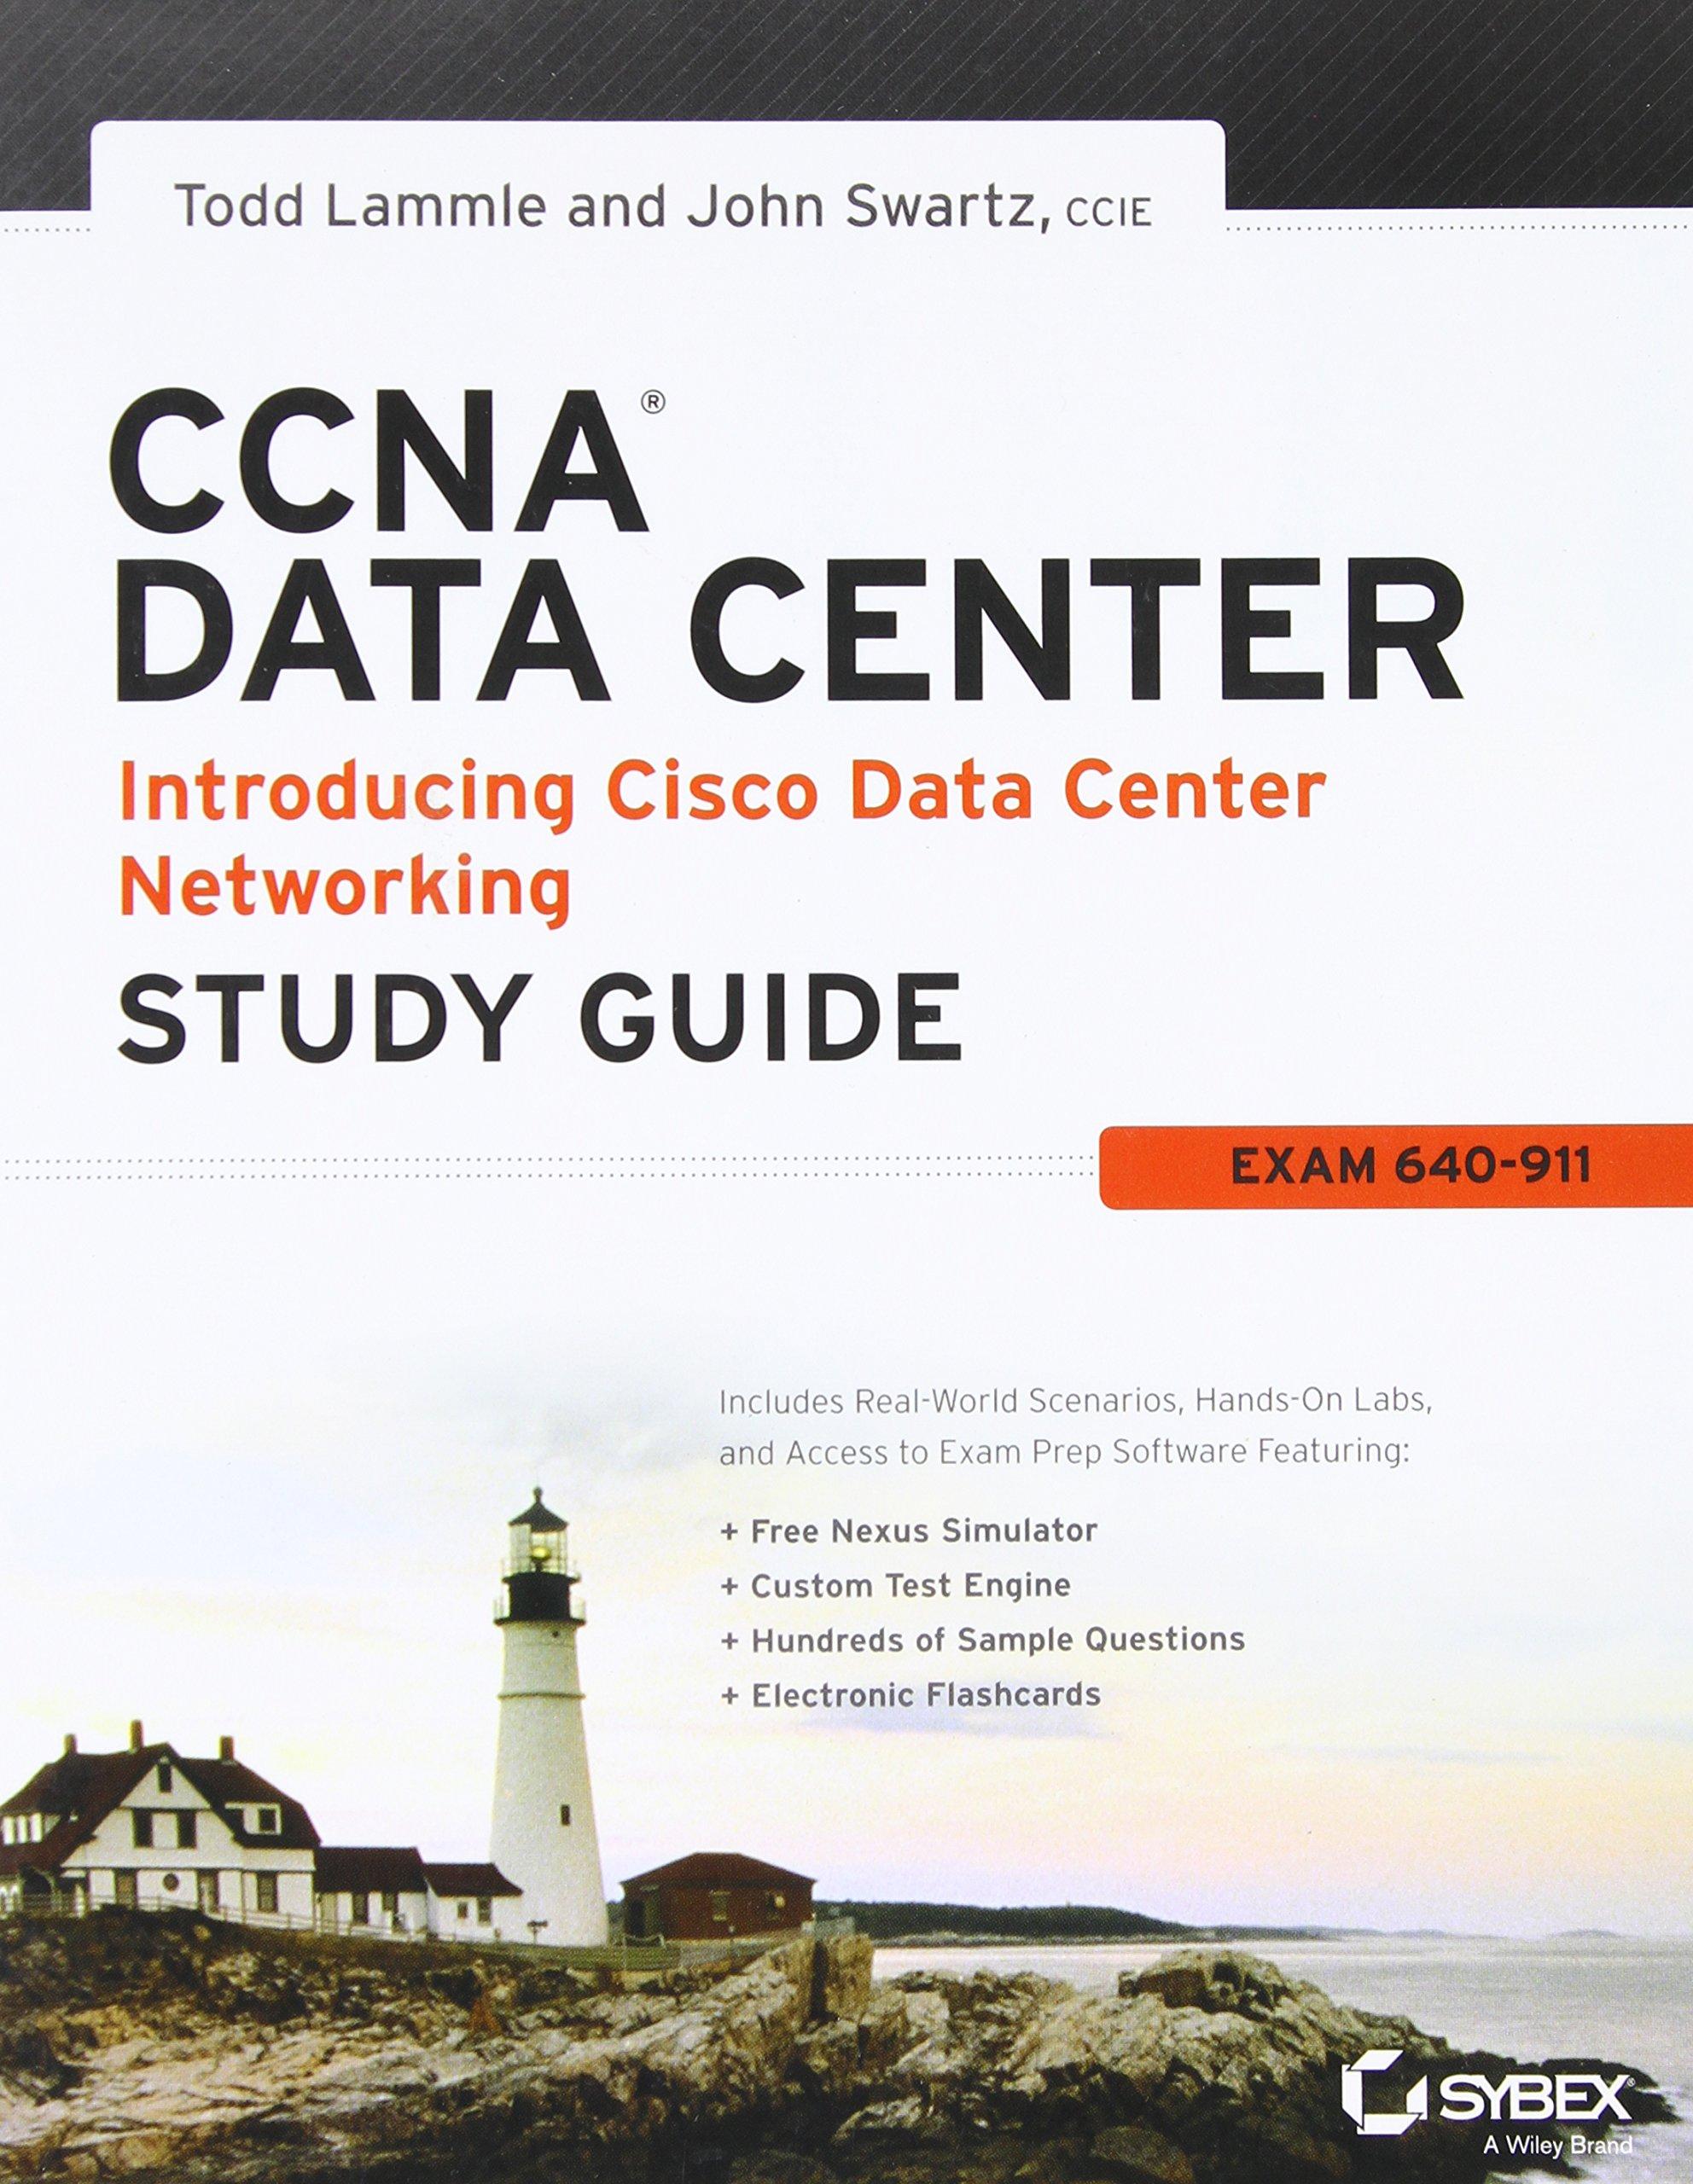 CCNA Data Center - Introducing Cisco Data Center Networking Study Guide:  Exam 640-911: Todd Lammle, John Swartz: Books - Amazon.ca